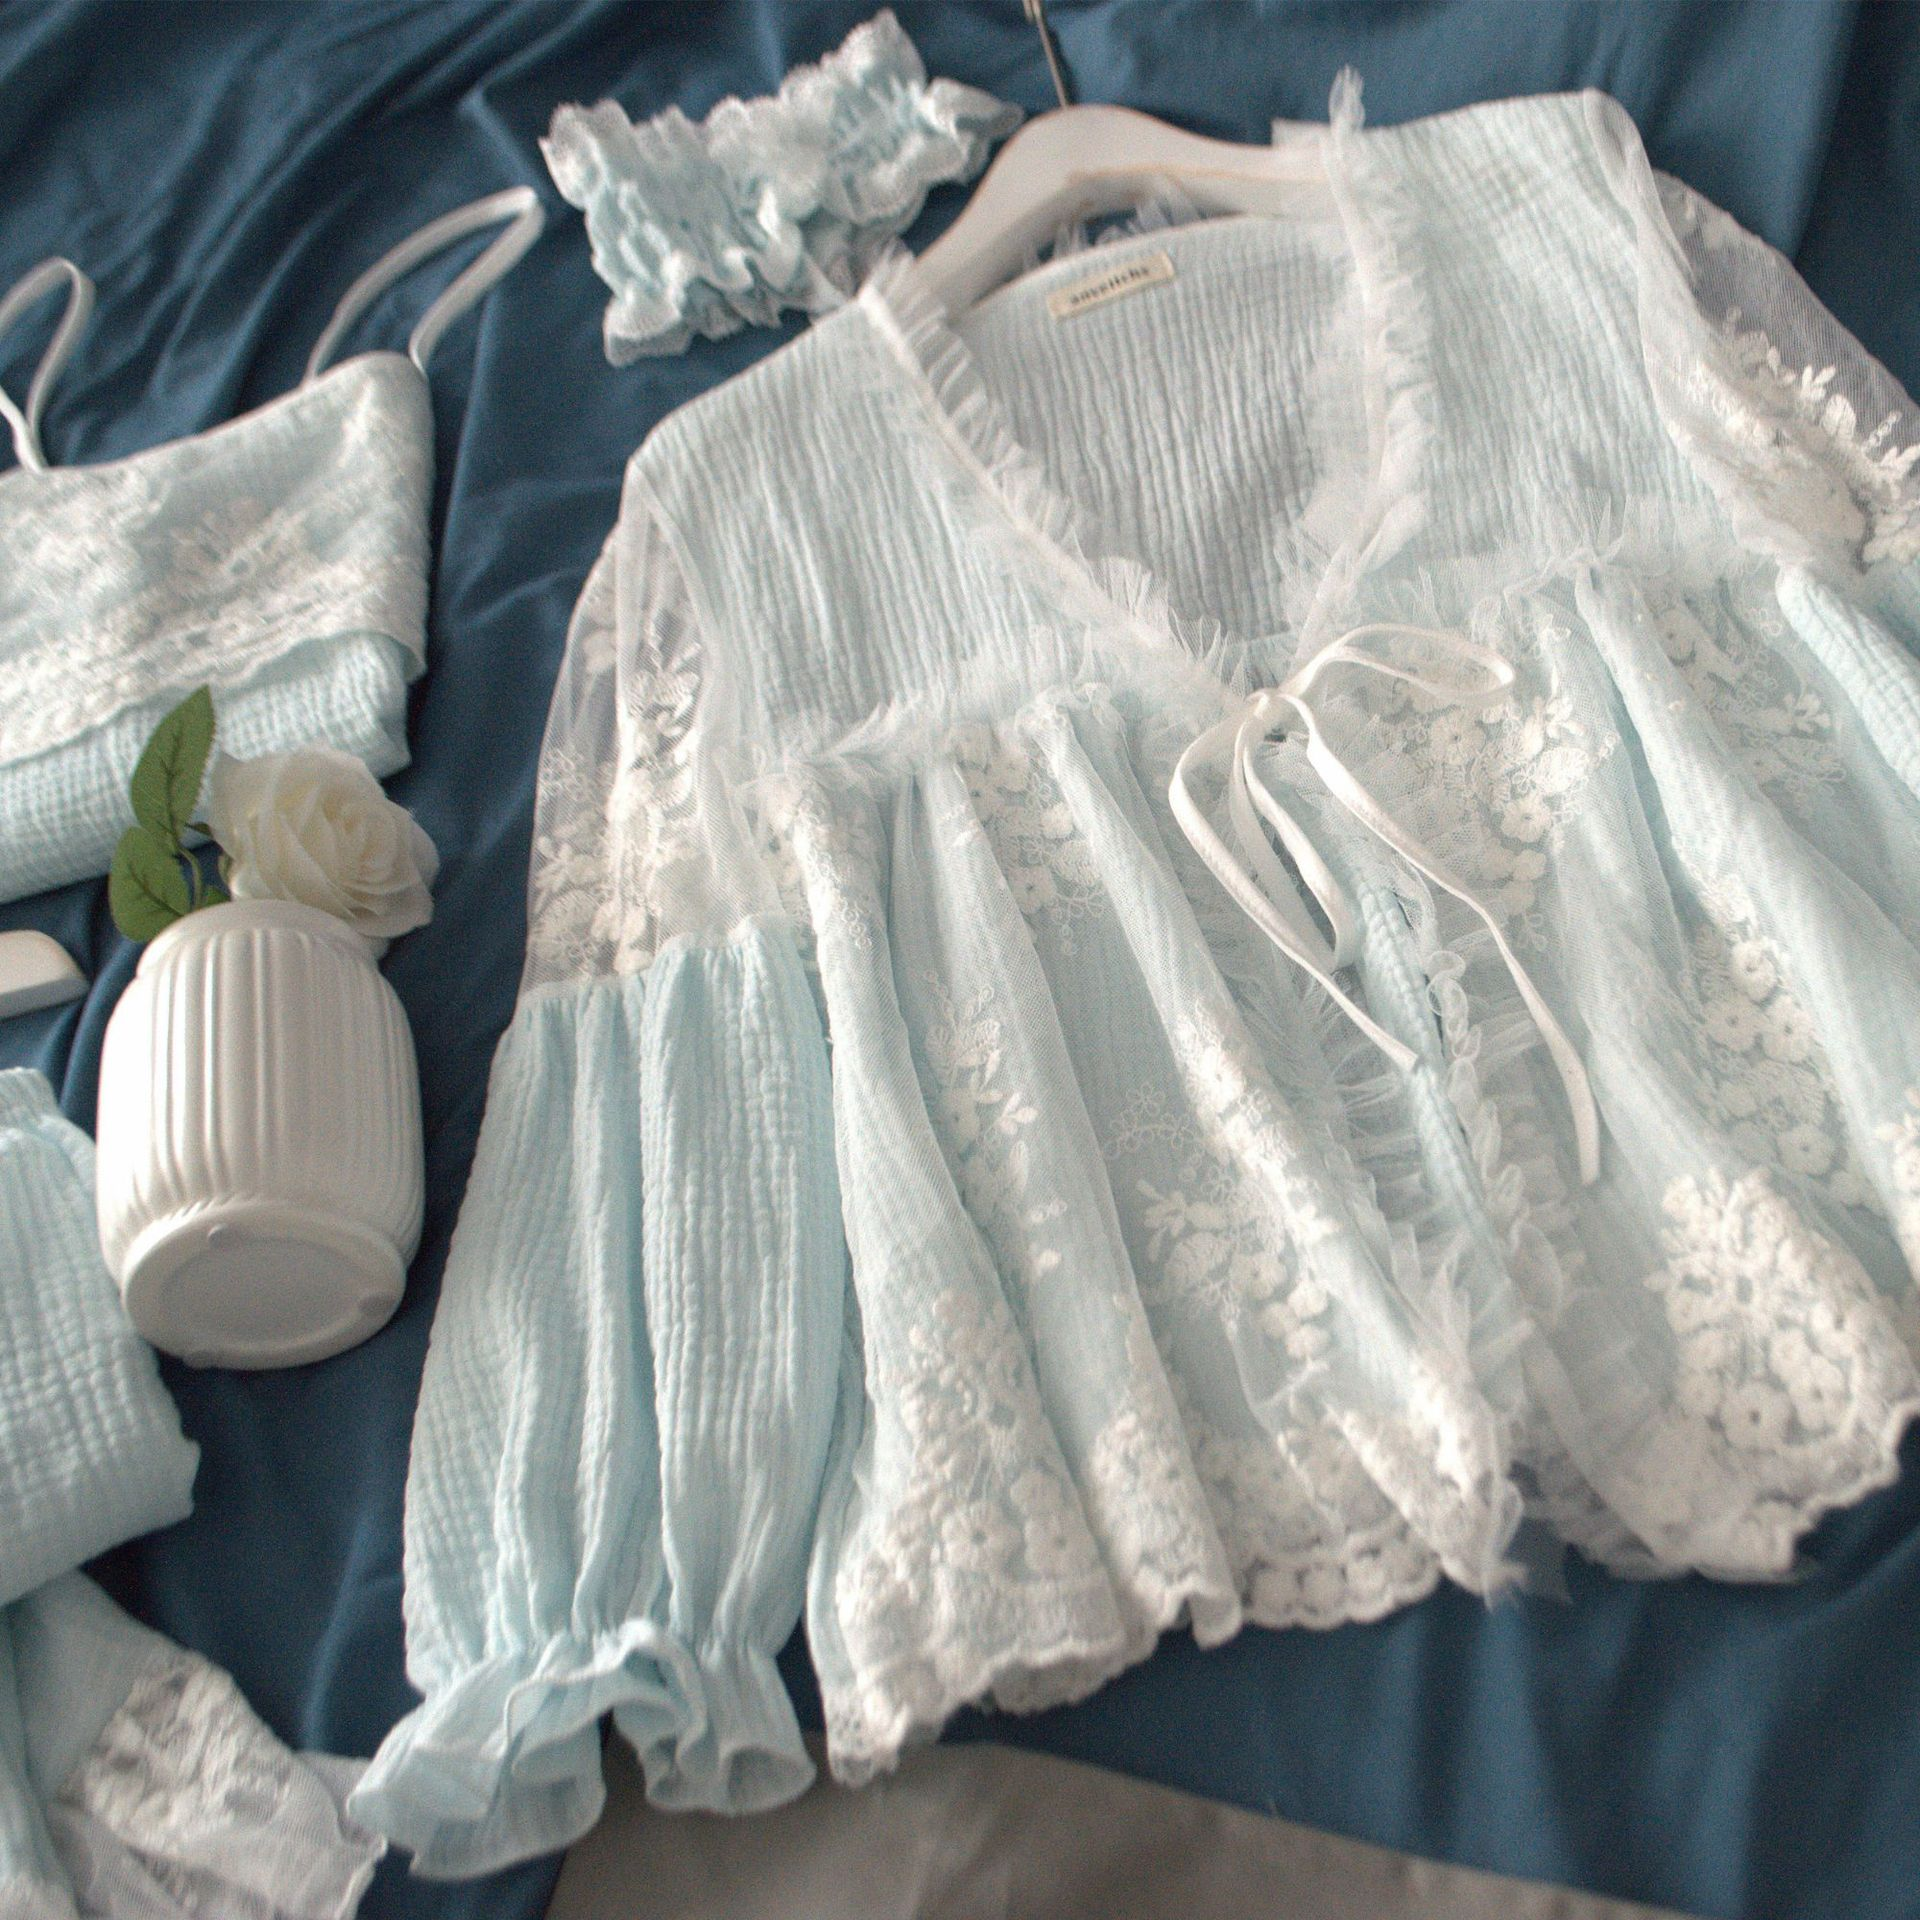 Spring Women   Pajamas     Sets   with Pants Cotton Sleepwear Cute Lace 3 Pieces V-Neck Double Gauze Thin Nightwear Pijama Nightsuit